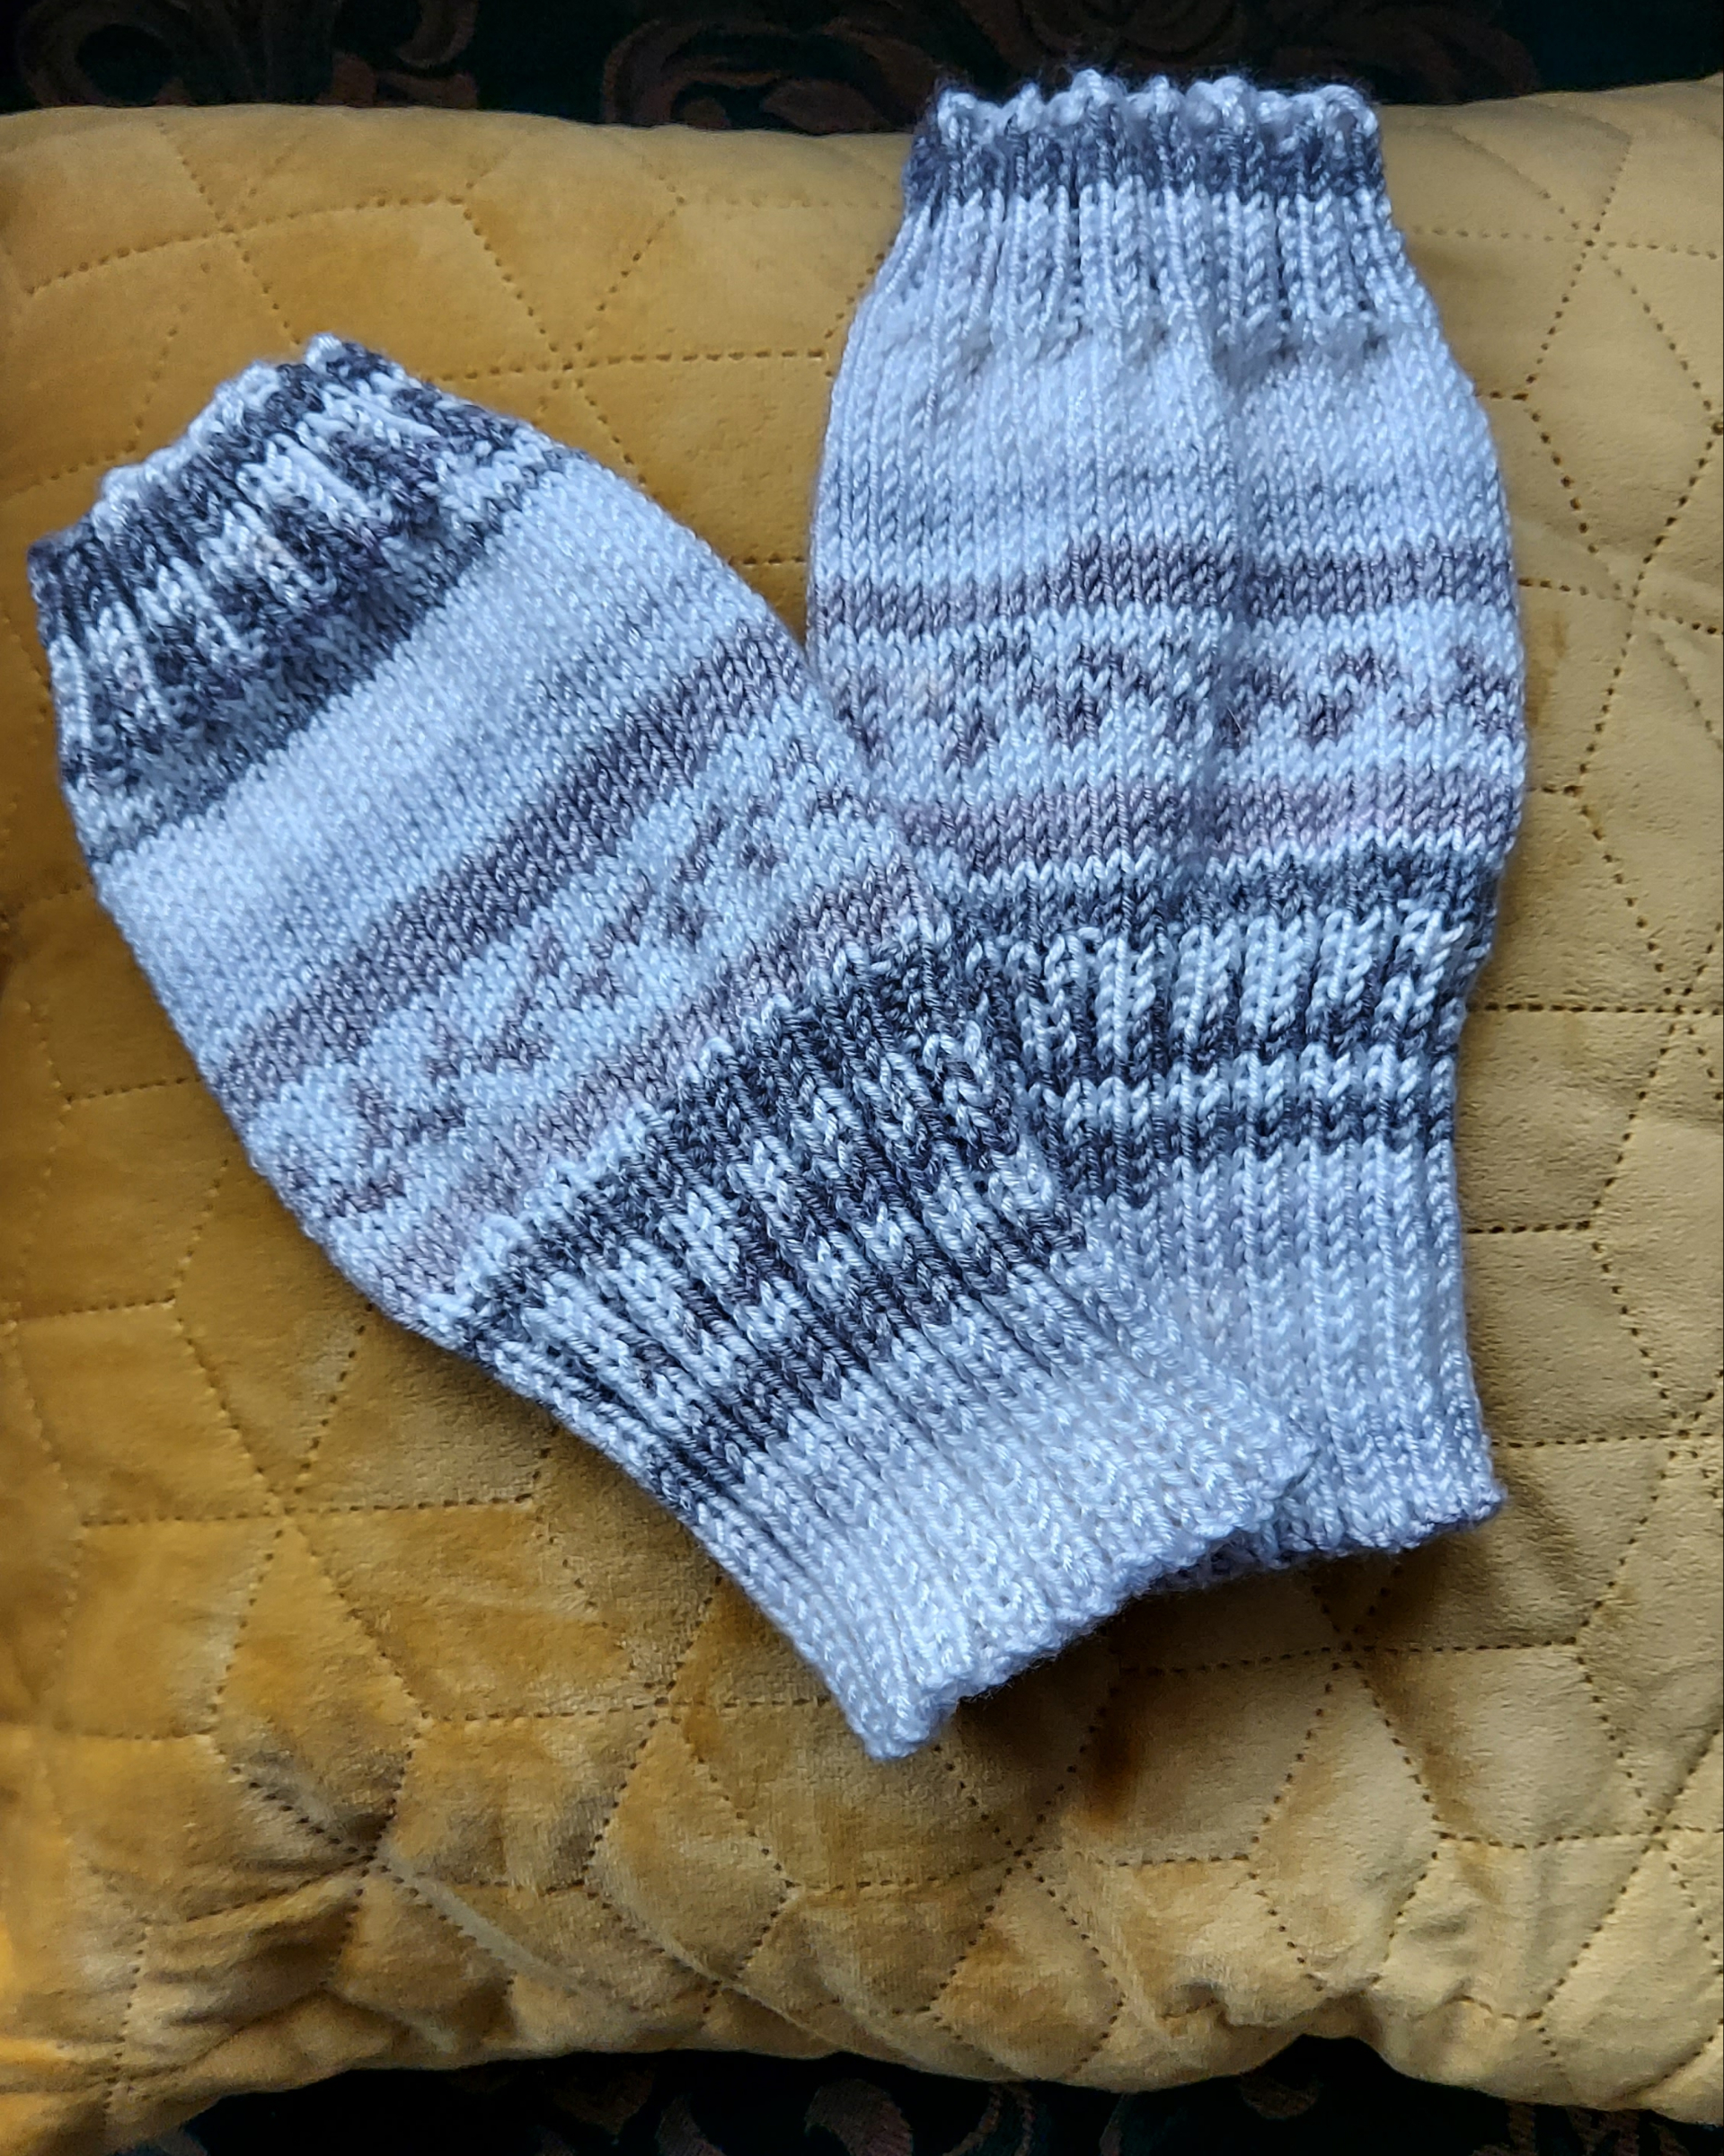 Hand knit legwarmers